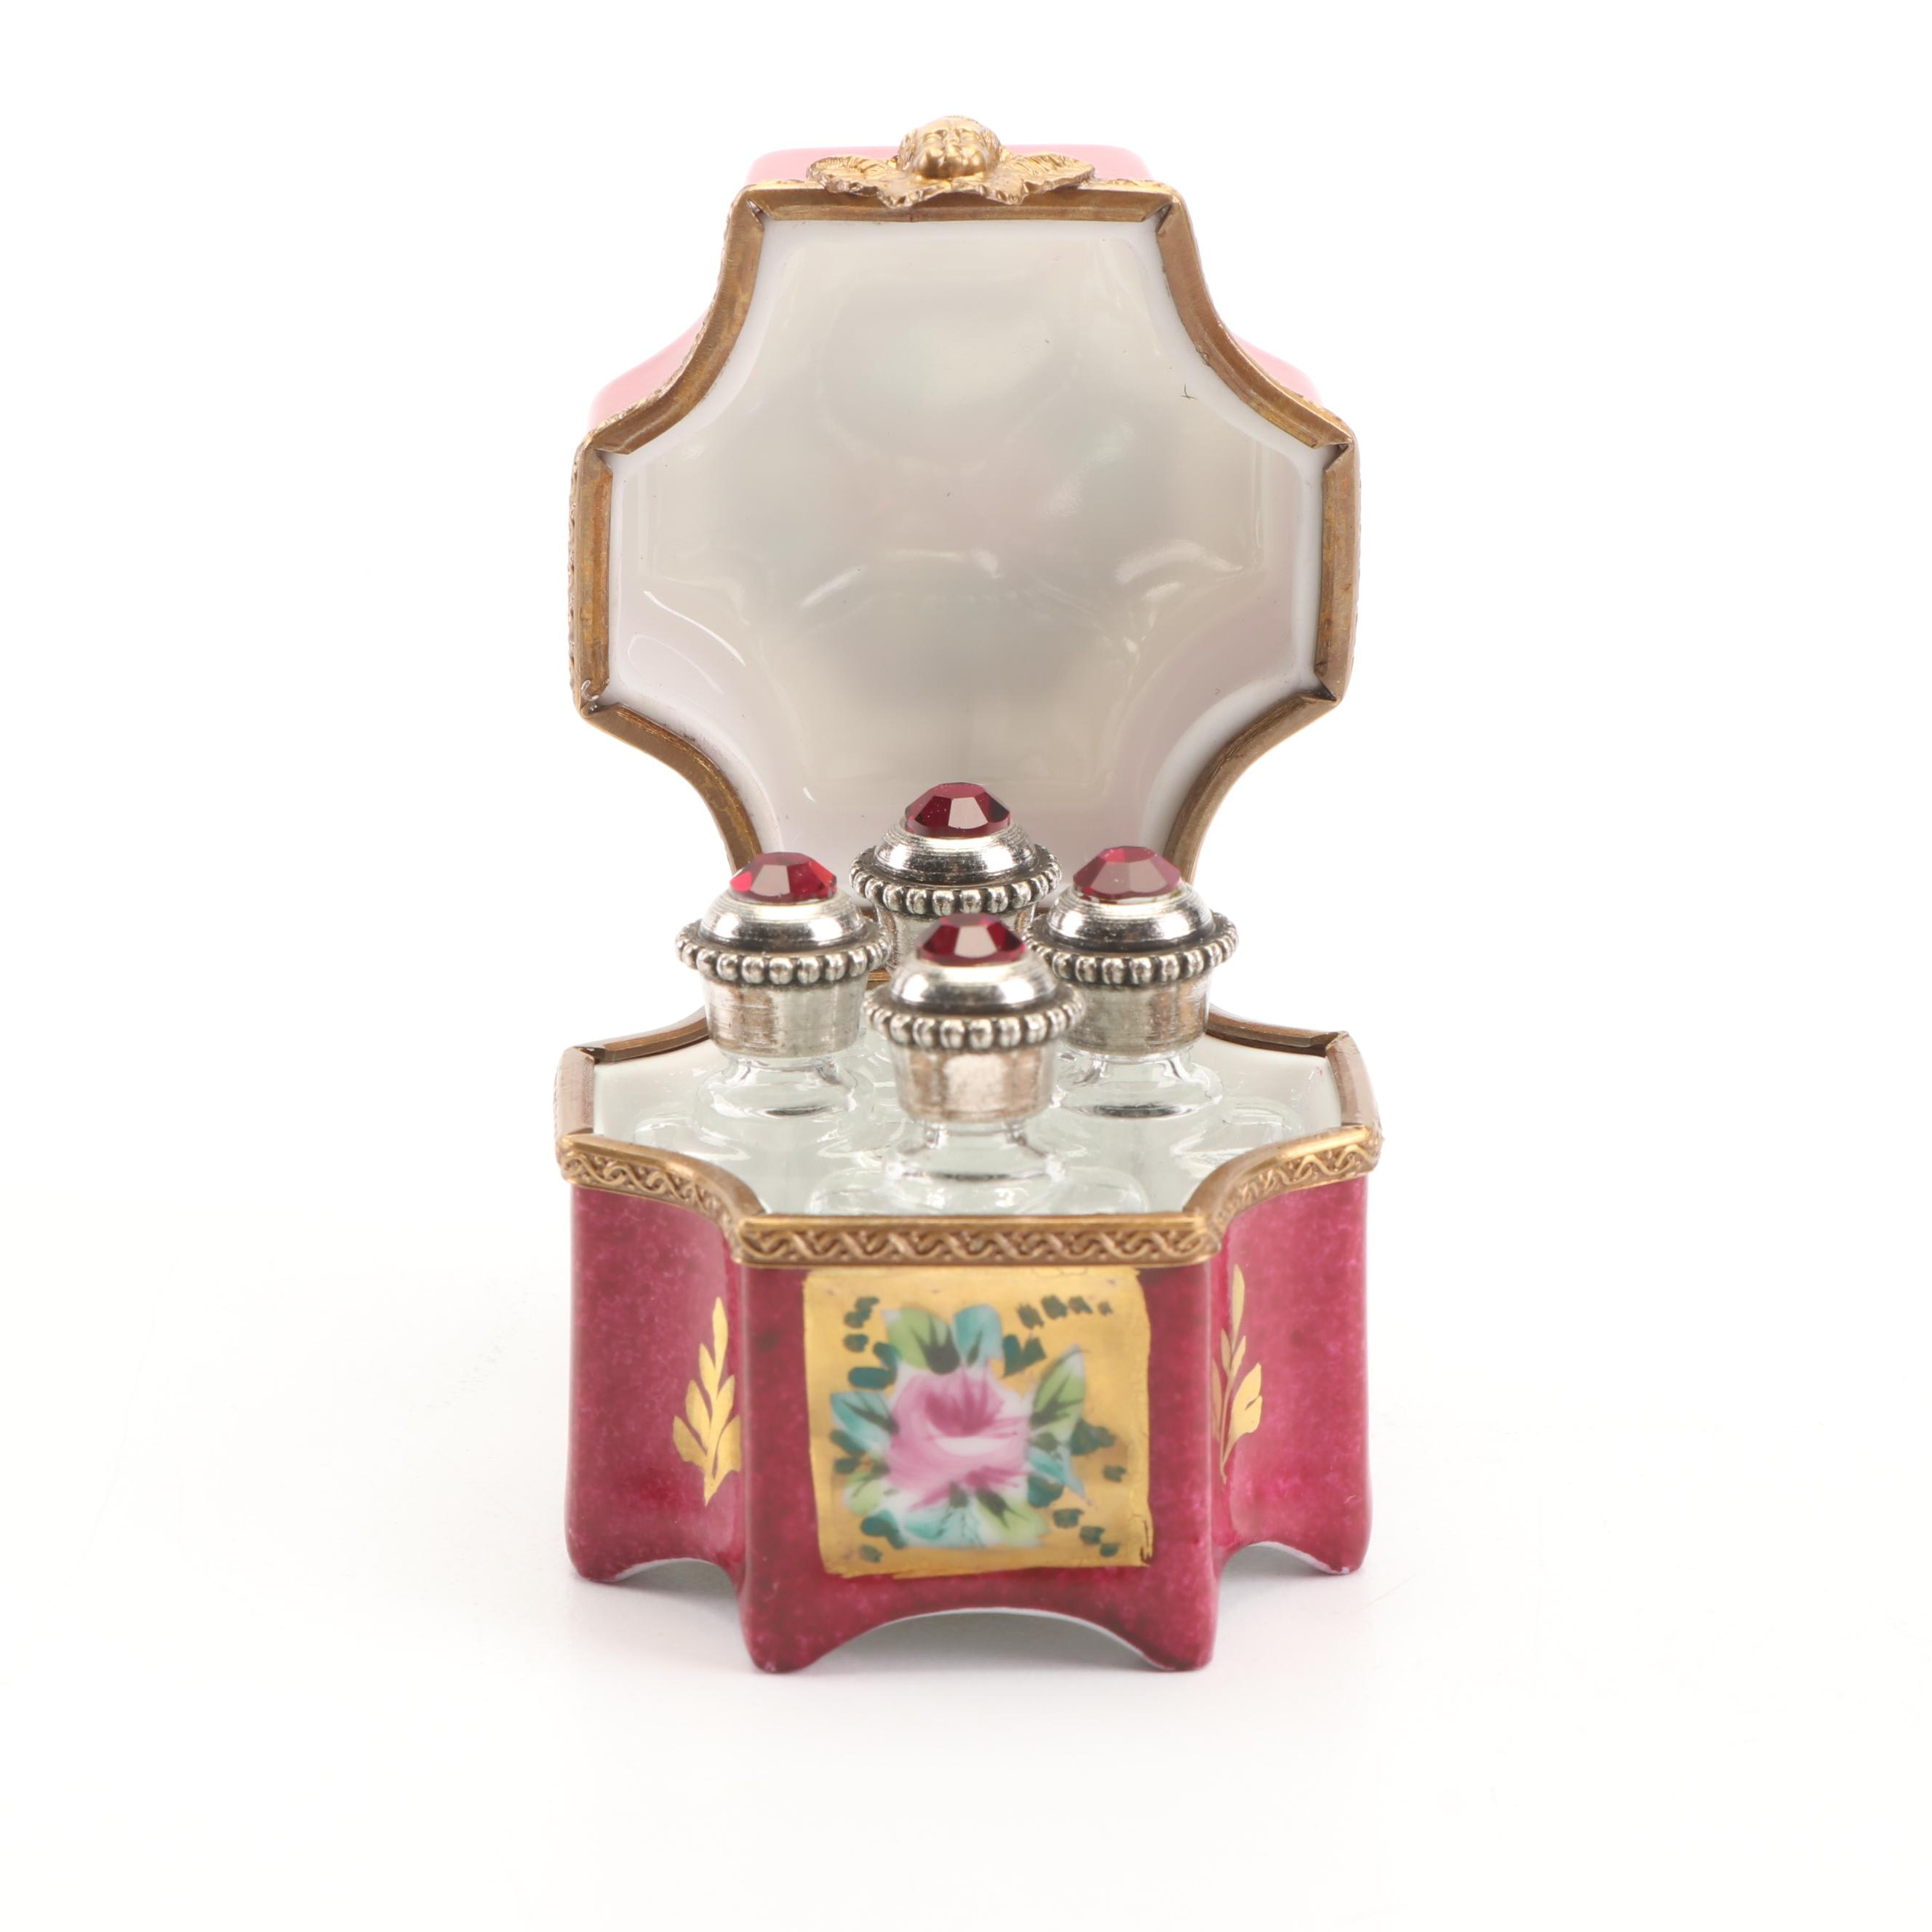 La Gloriette Limoges Perfume Bottle Coffret